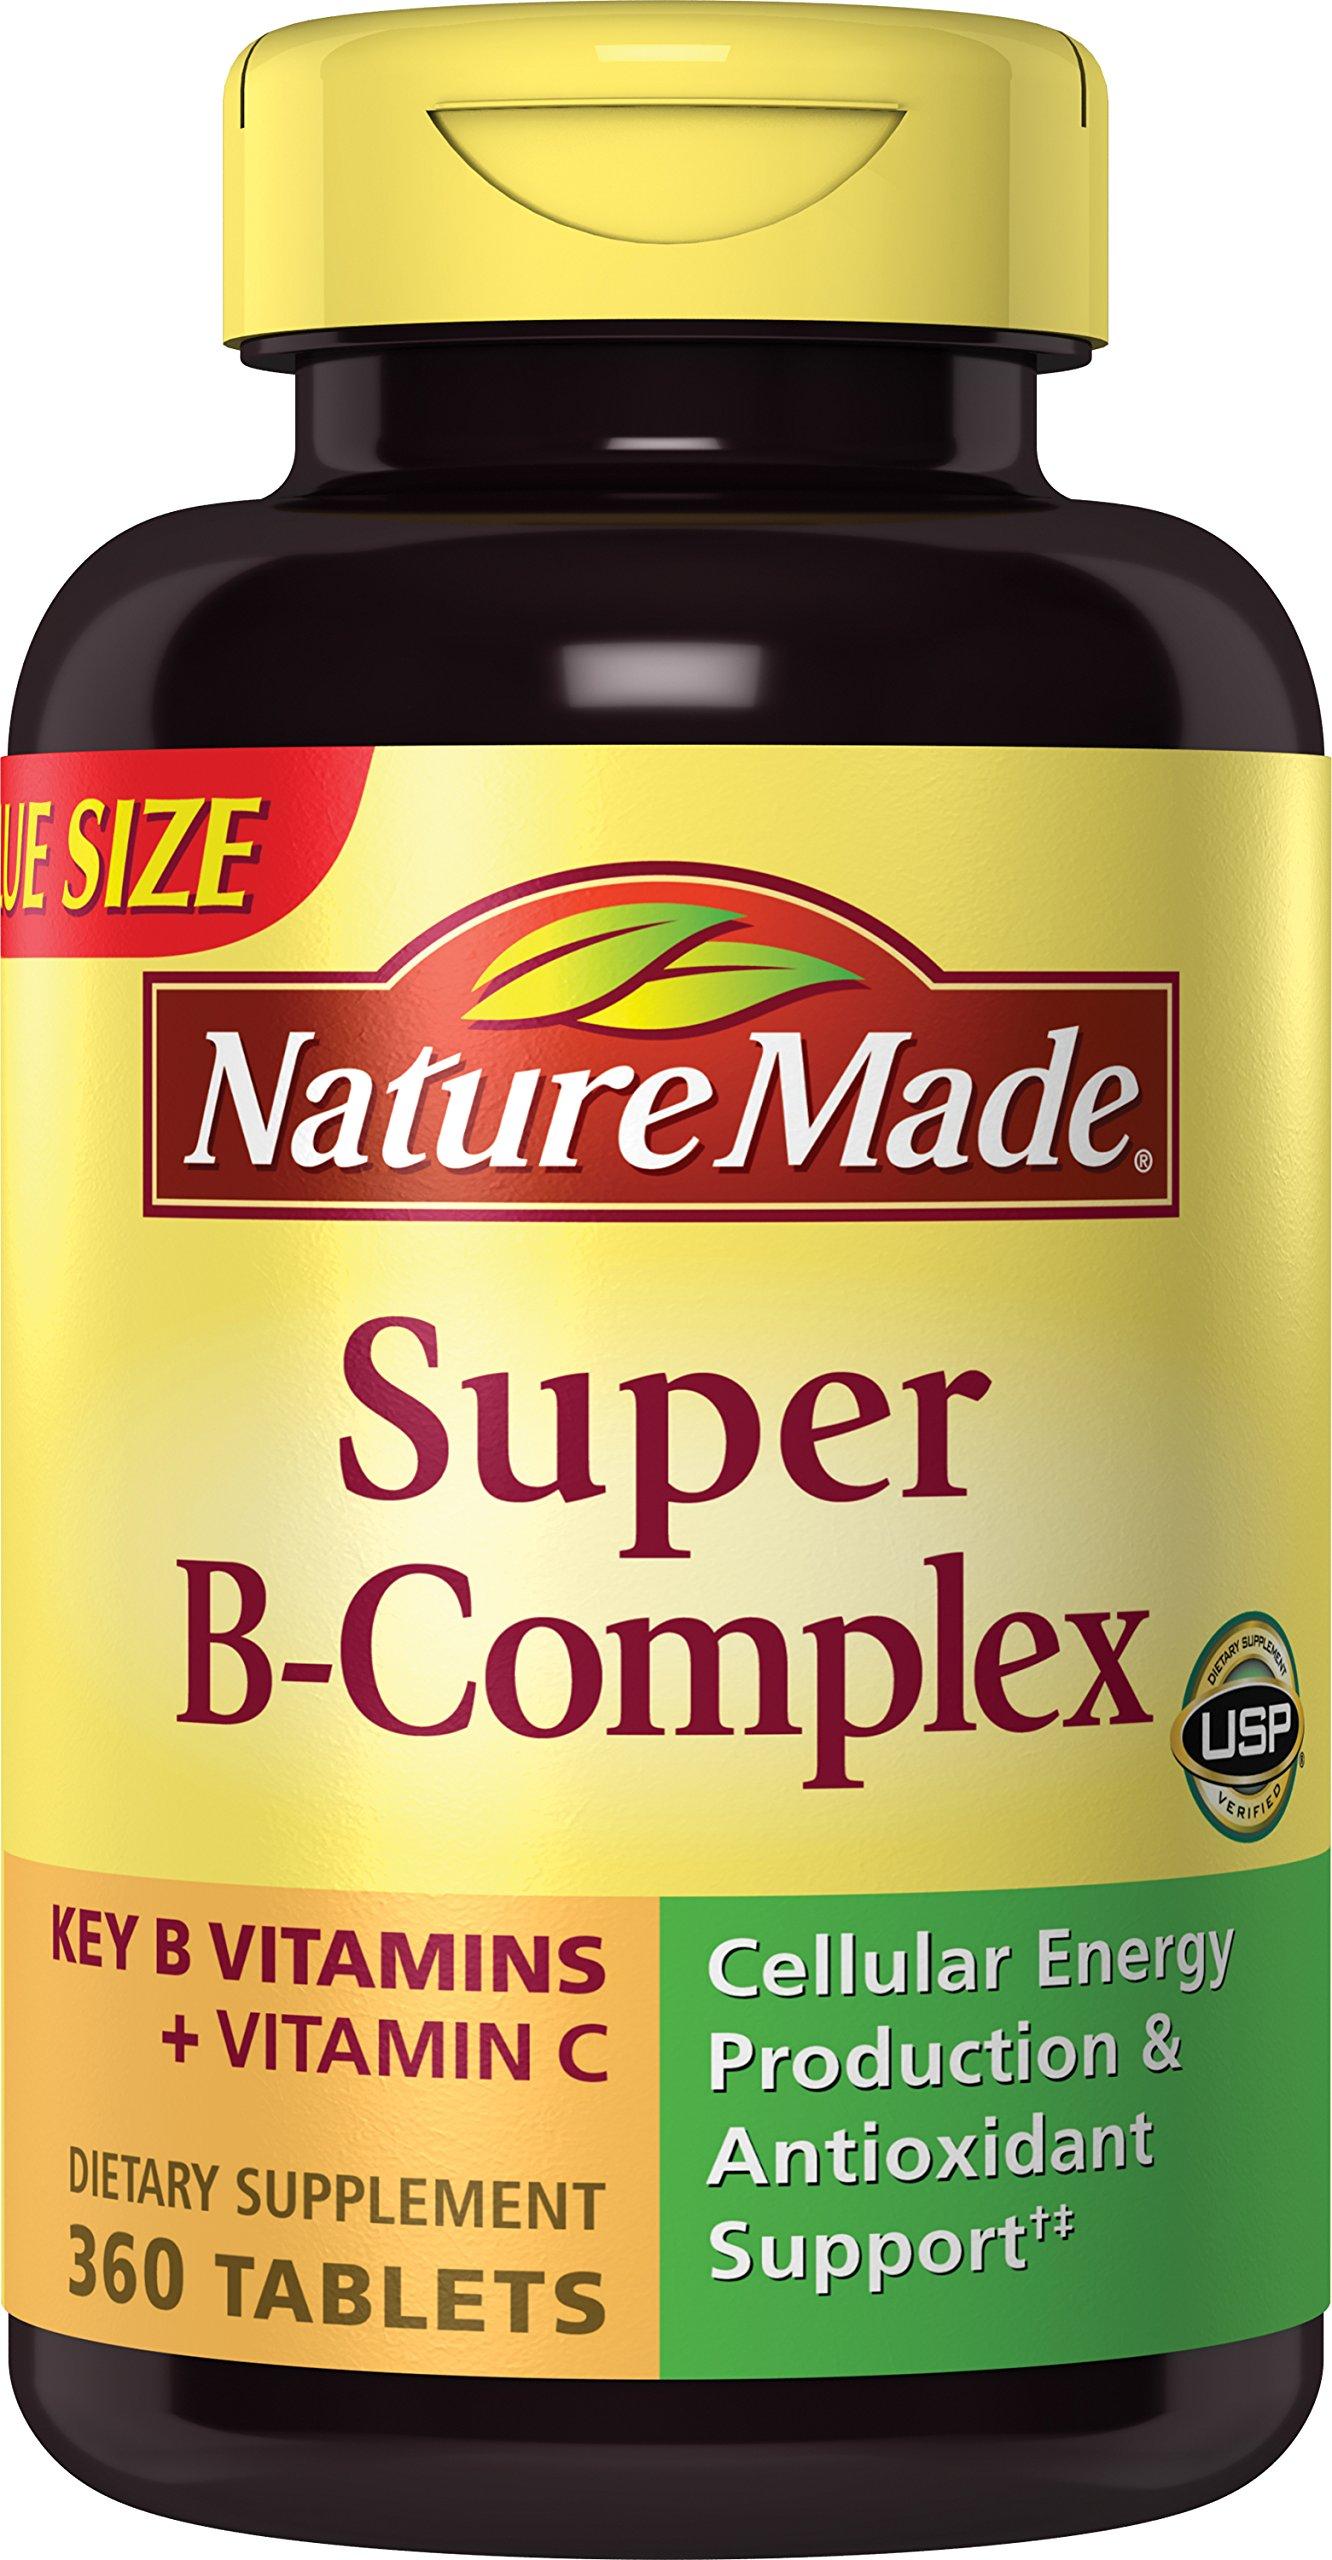 Nature Made Super Vitamin B-Complex + Vitamin C Tablets, 360 ct